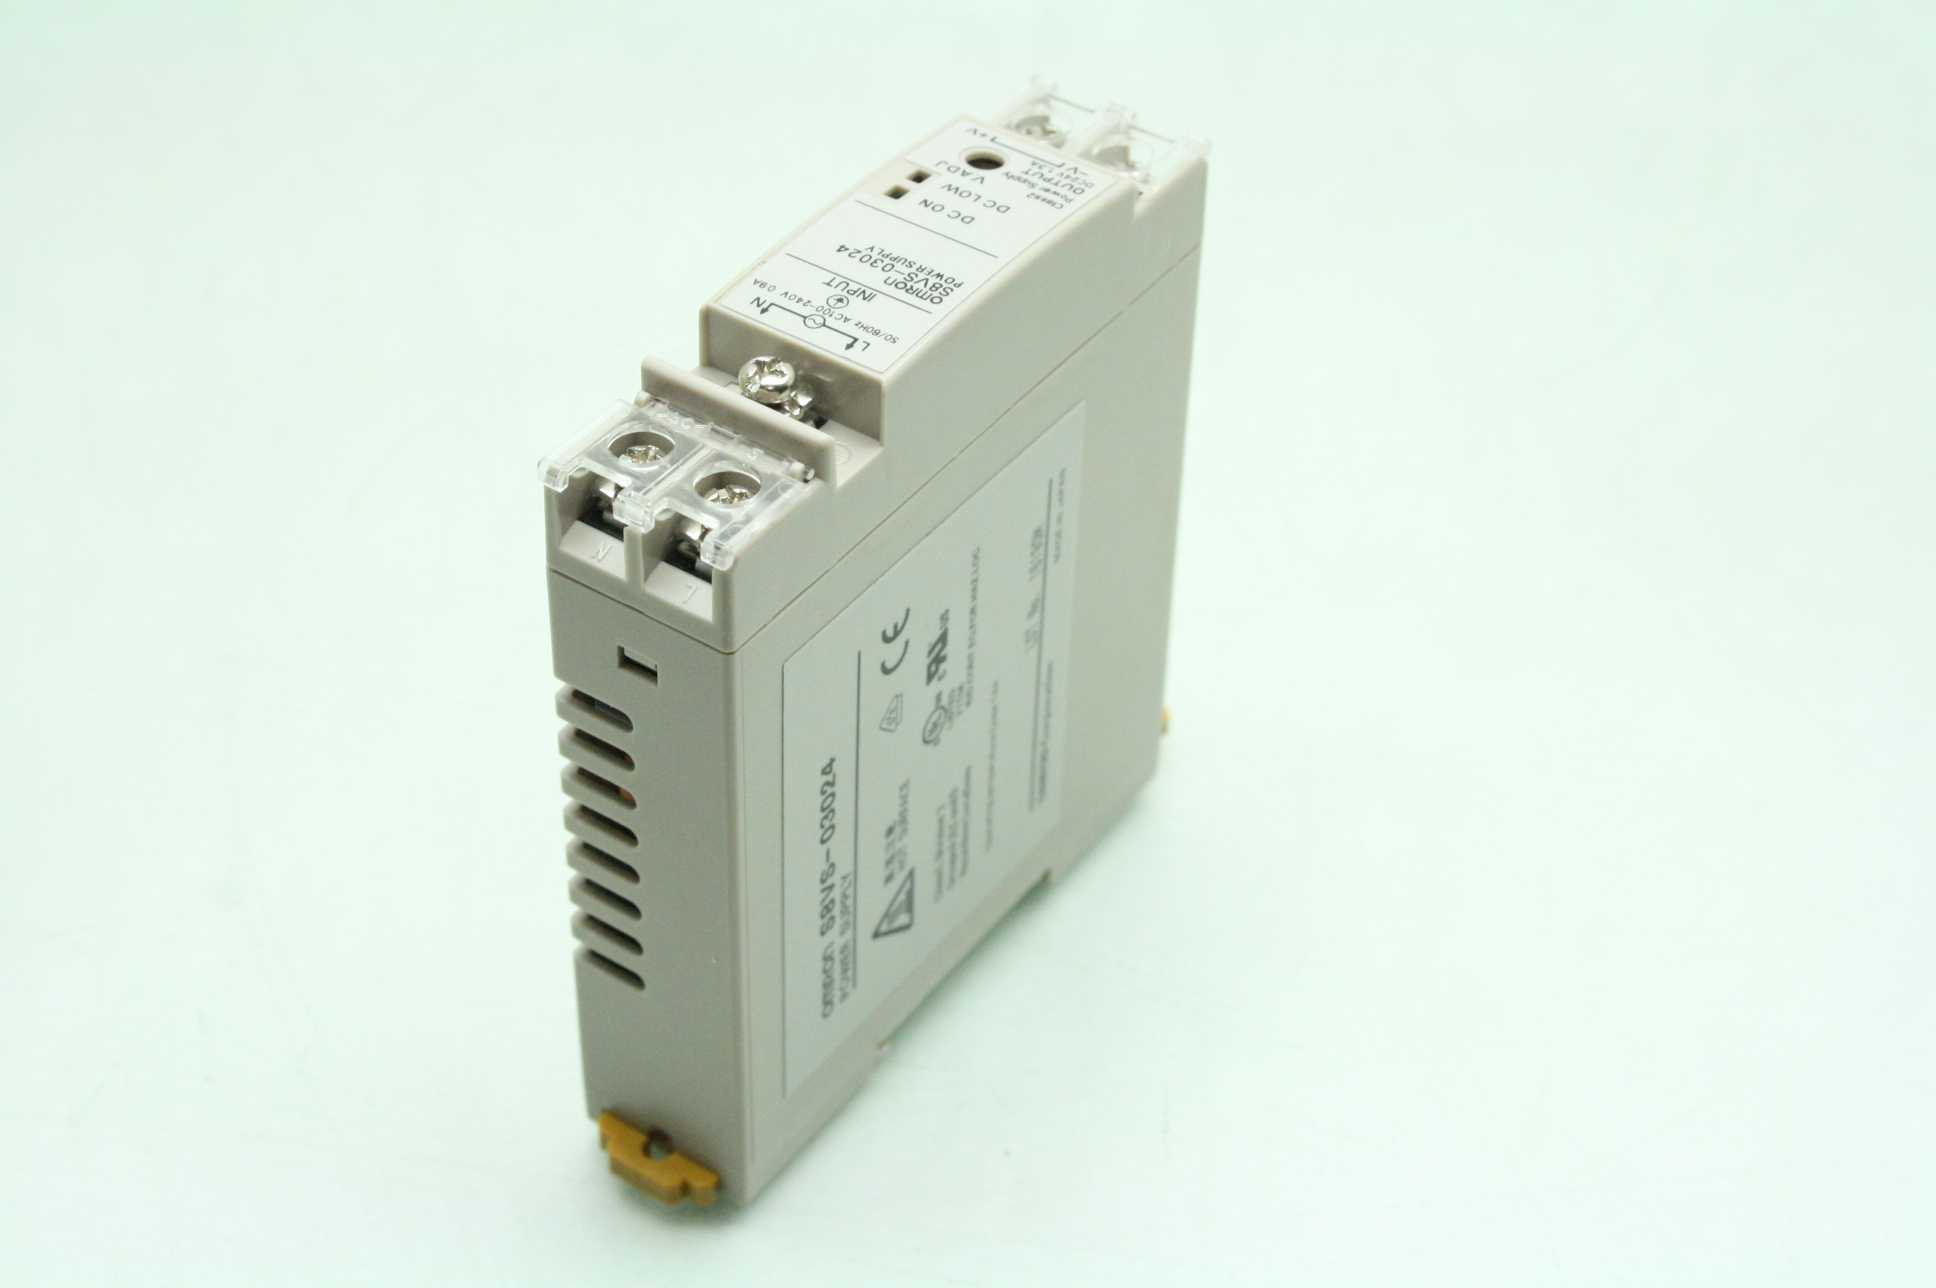 omron 24v relay wiring diagram 7 way blade trailer s8vs 03024 automation power supply 30w ebay